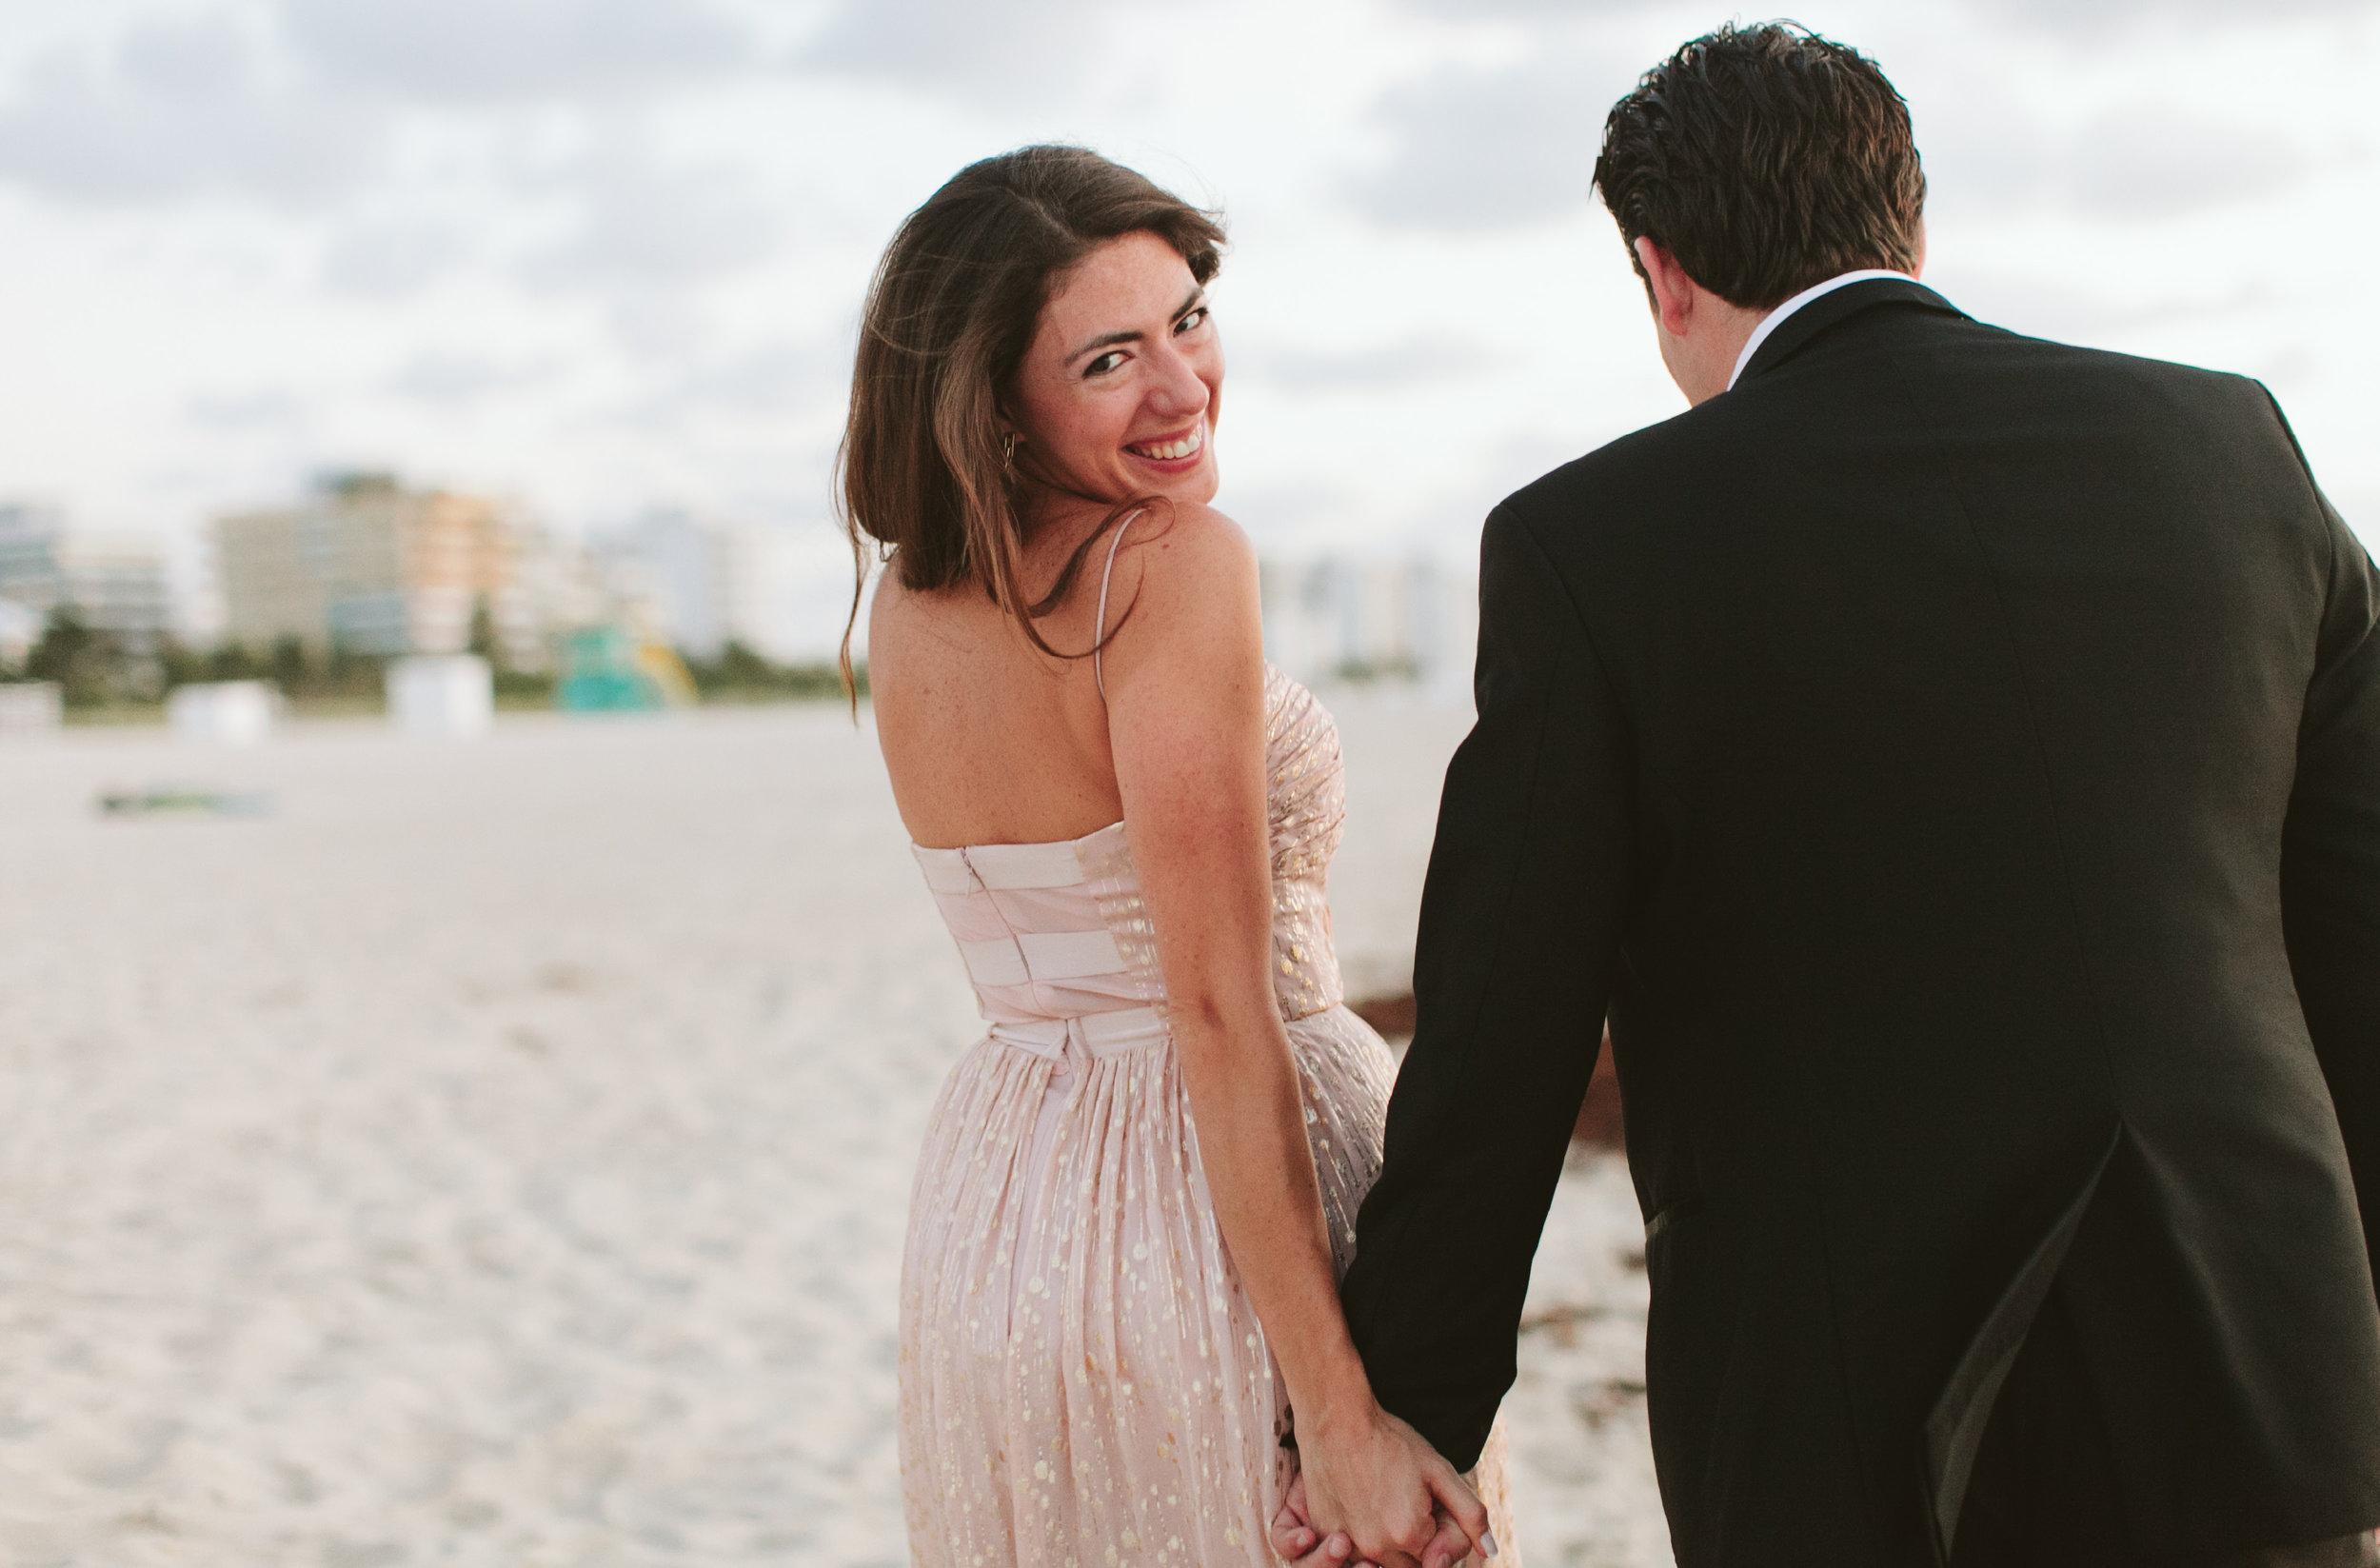 Meli + Mike South Pointe Park South Beach Miami Engagement Shoot14.jpg